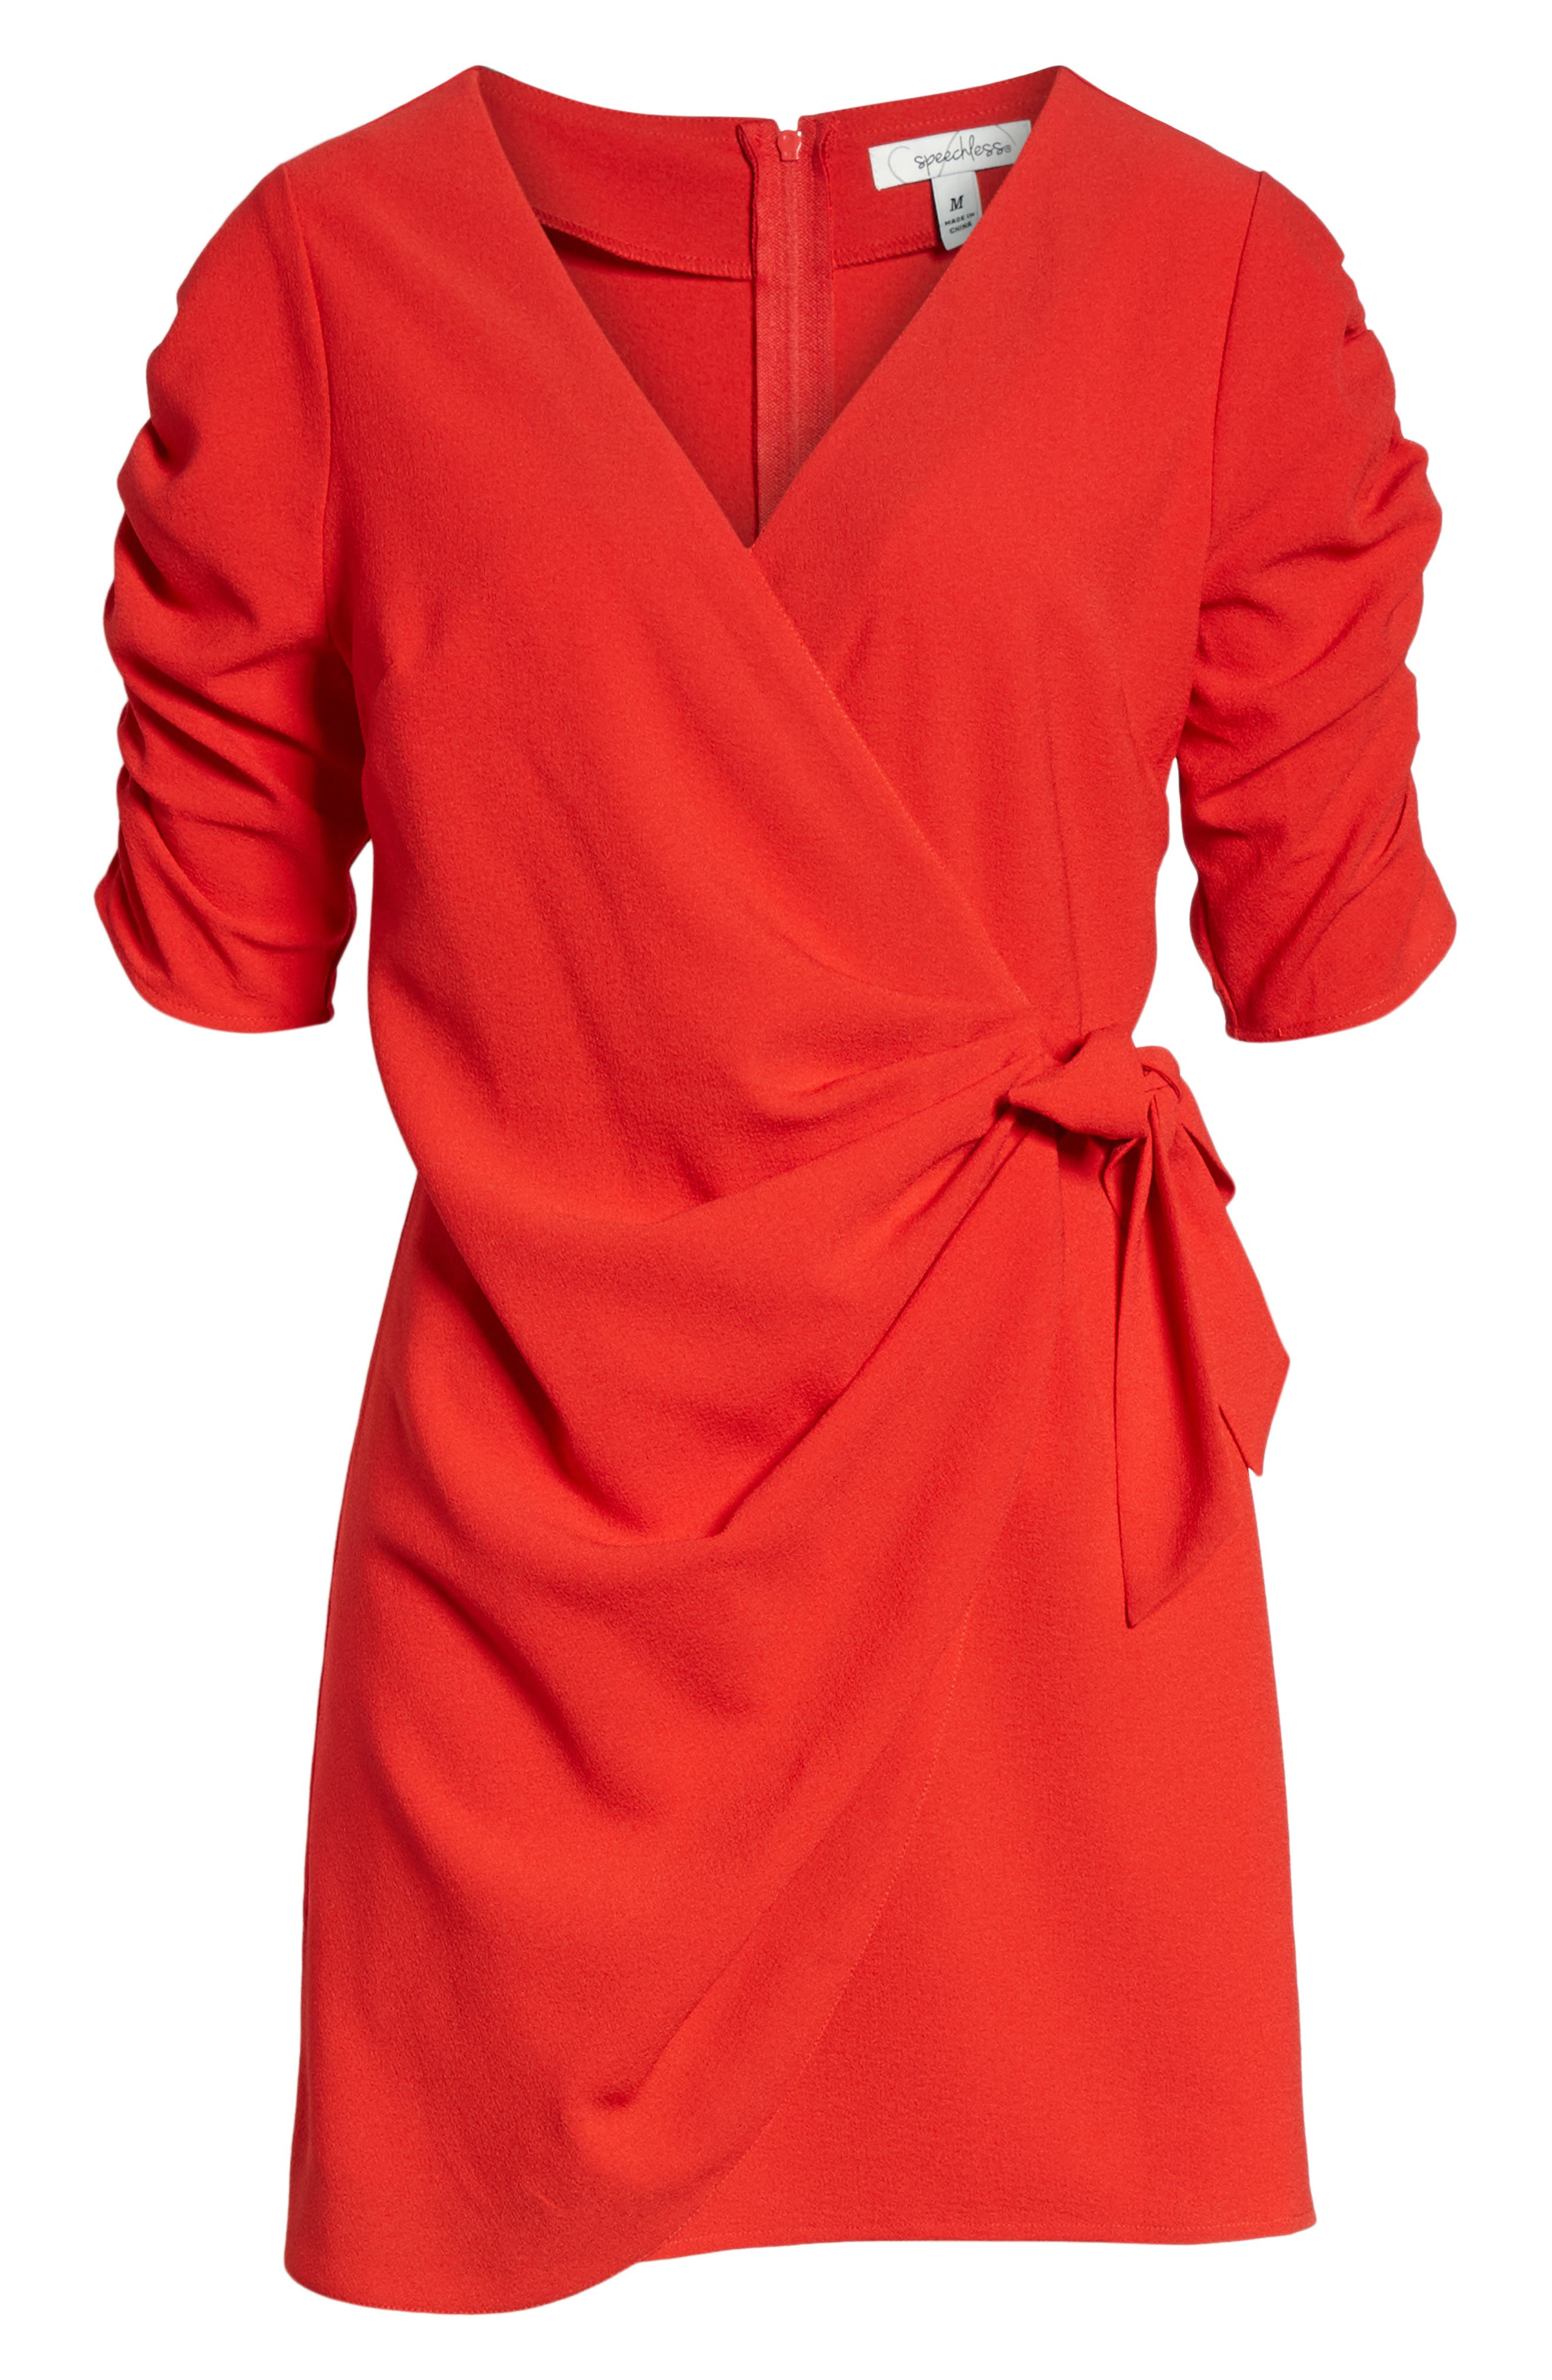 SPEECHLESS, Cinch Sleeve Faux Wrap Dress, Alternate thumbnail 7, color, 600